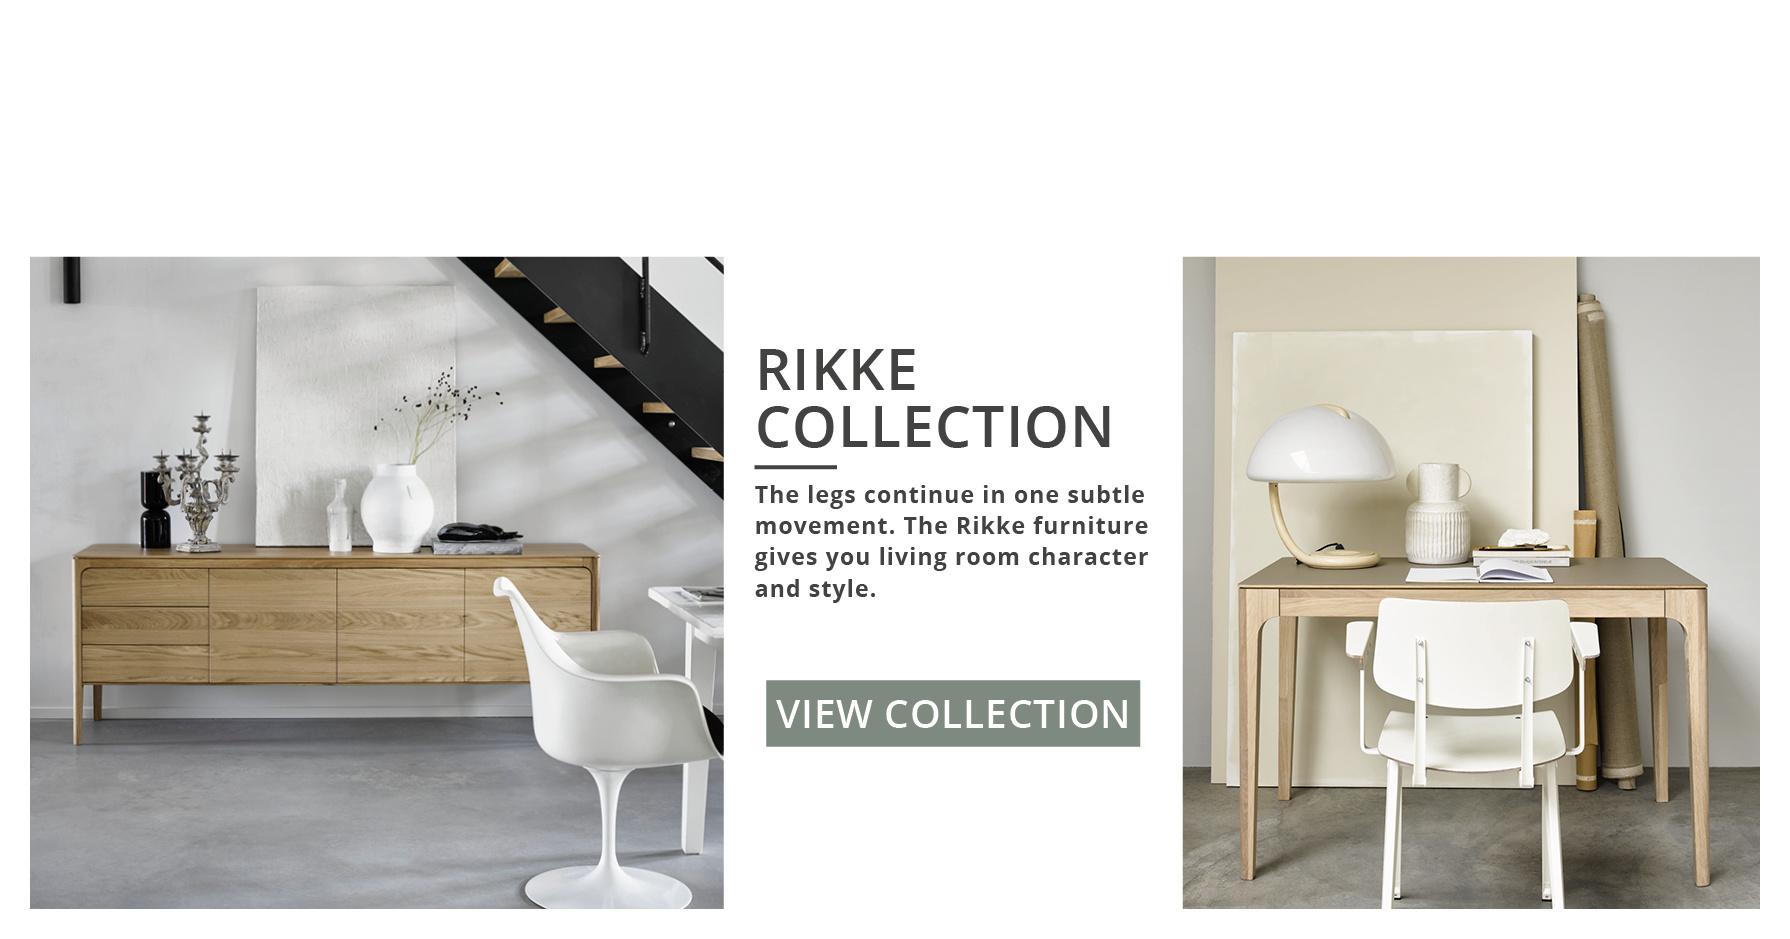 Rikke collection